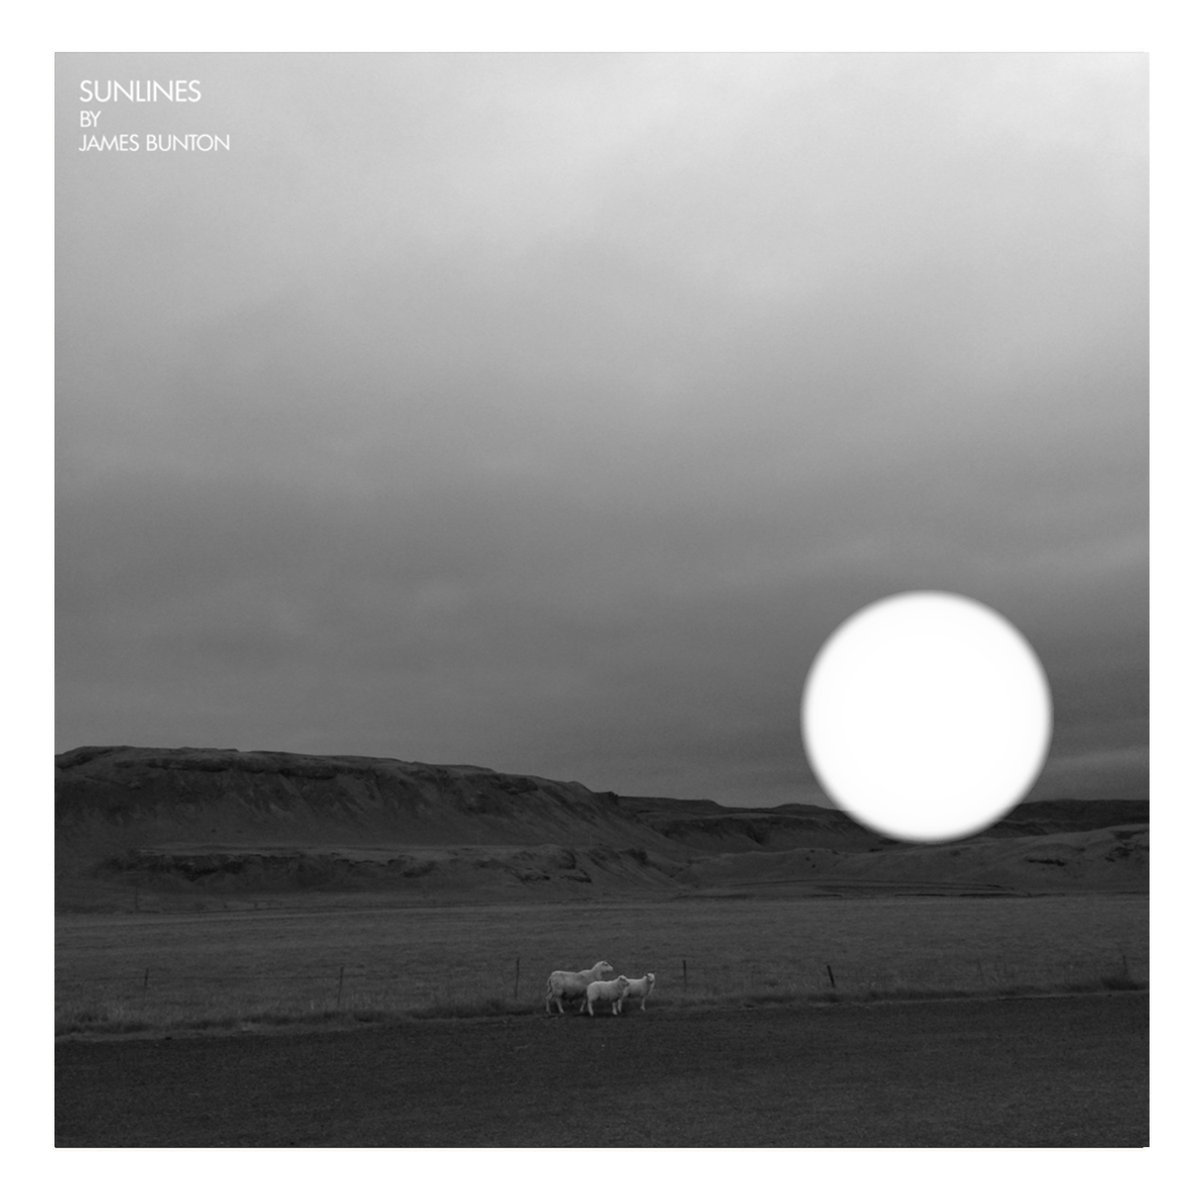 James Bunton: Sunlines (2017)